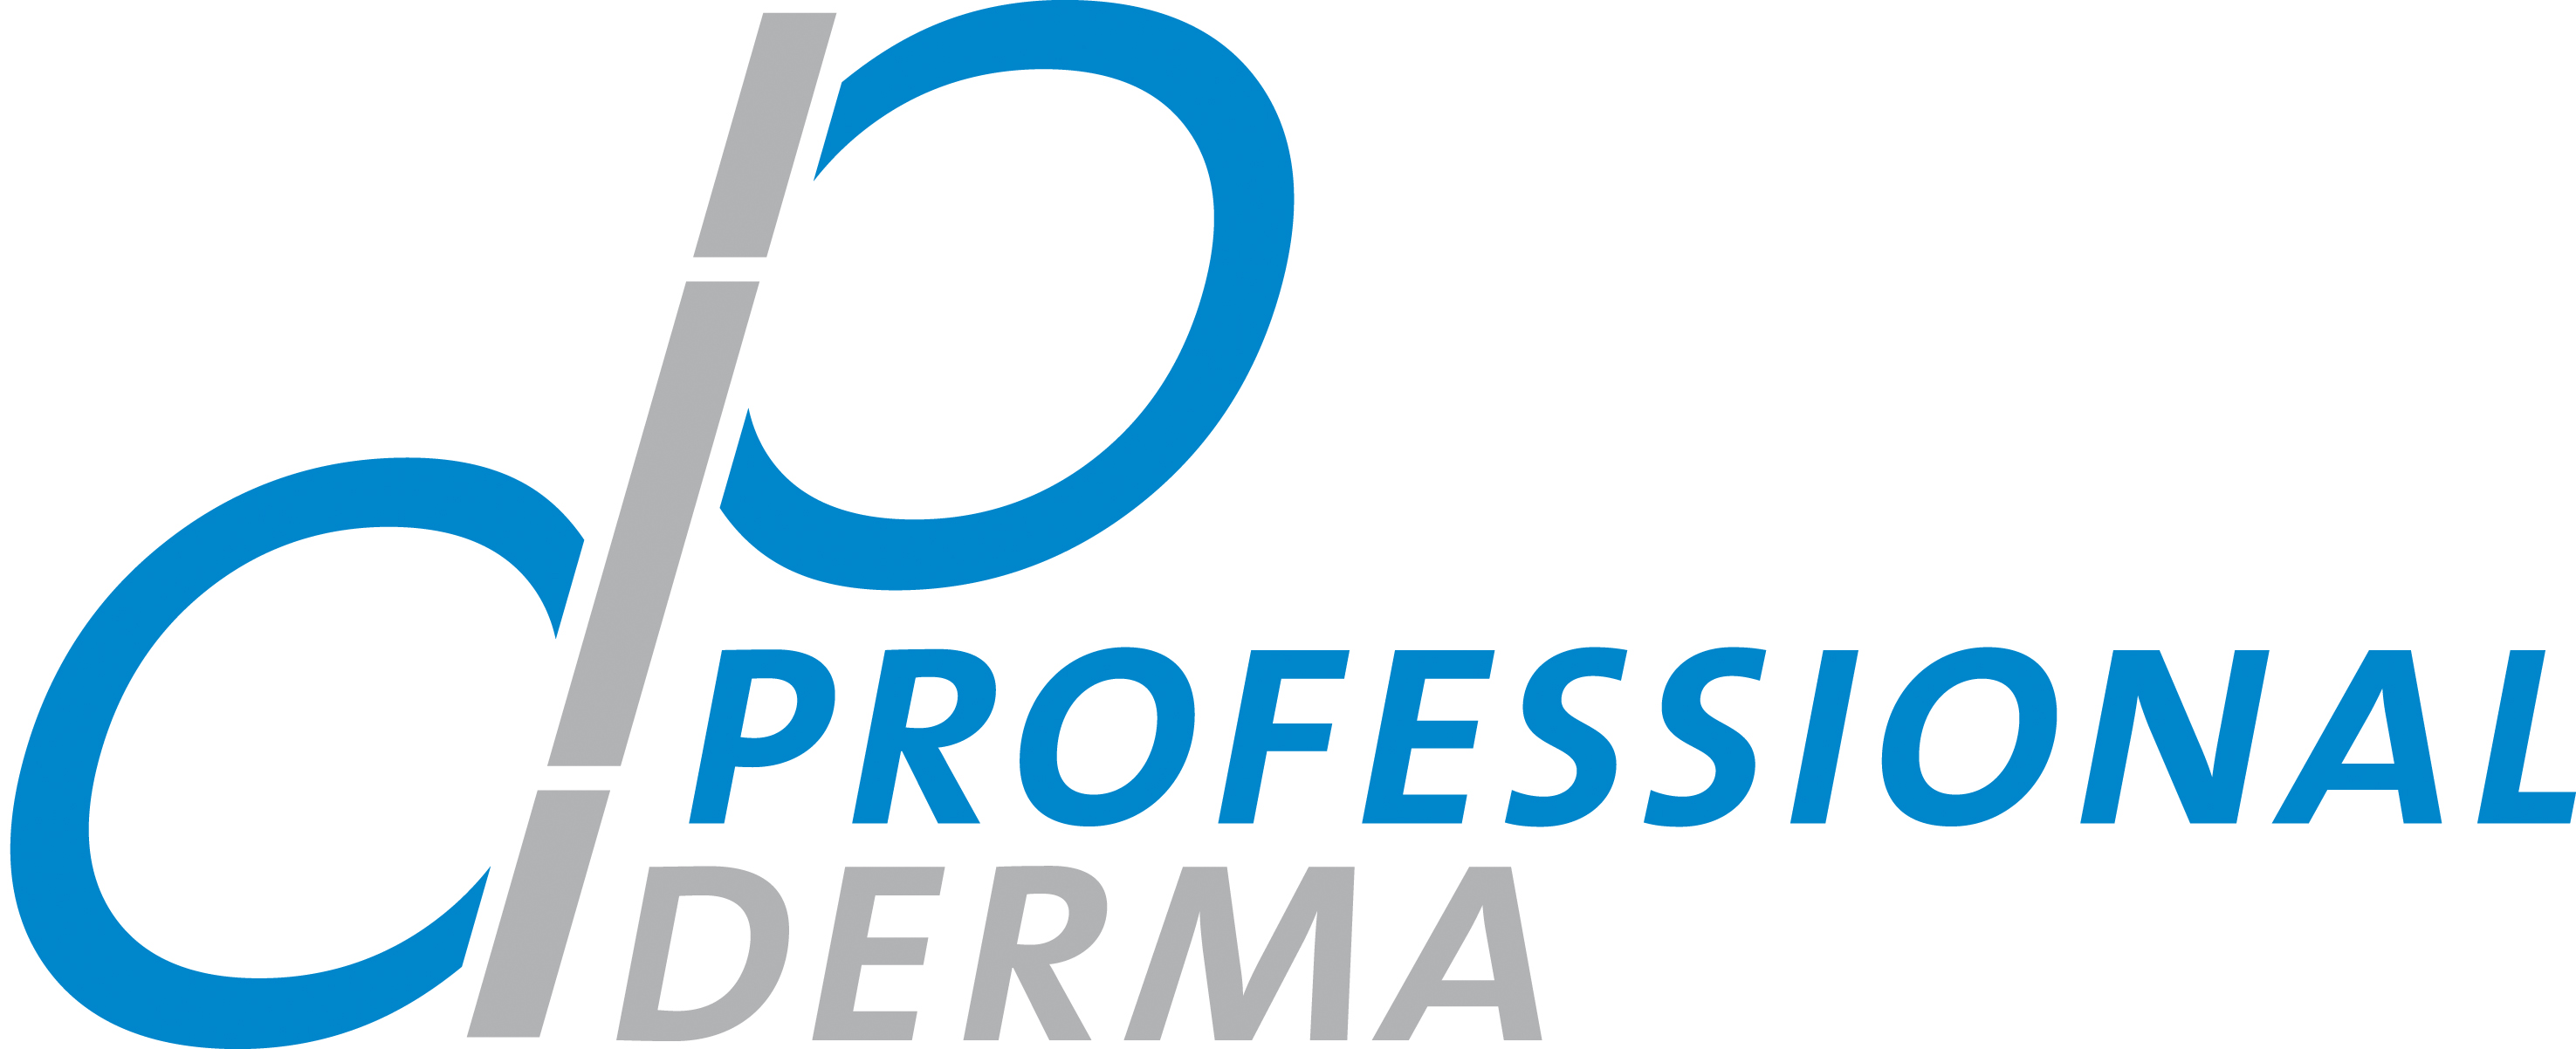 Bild Professional Derma SA